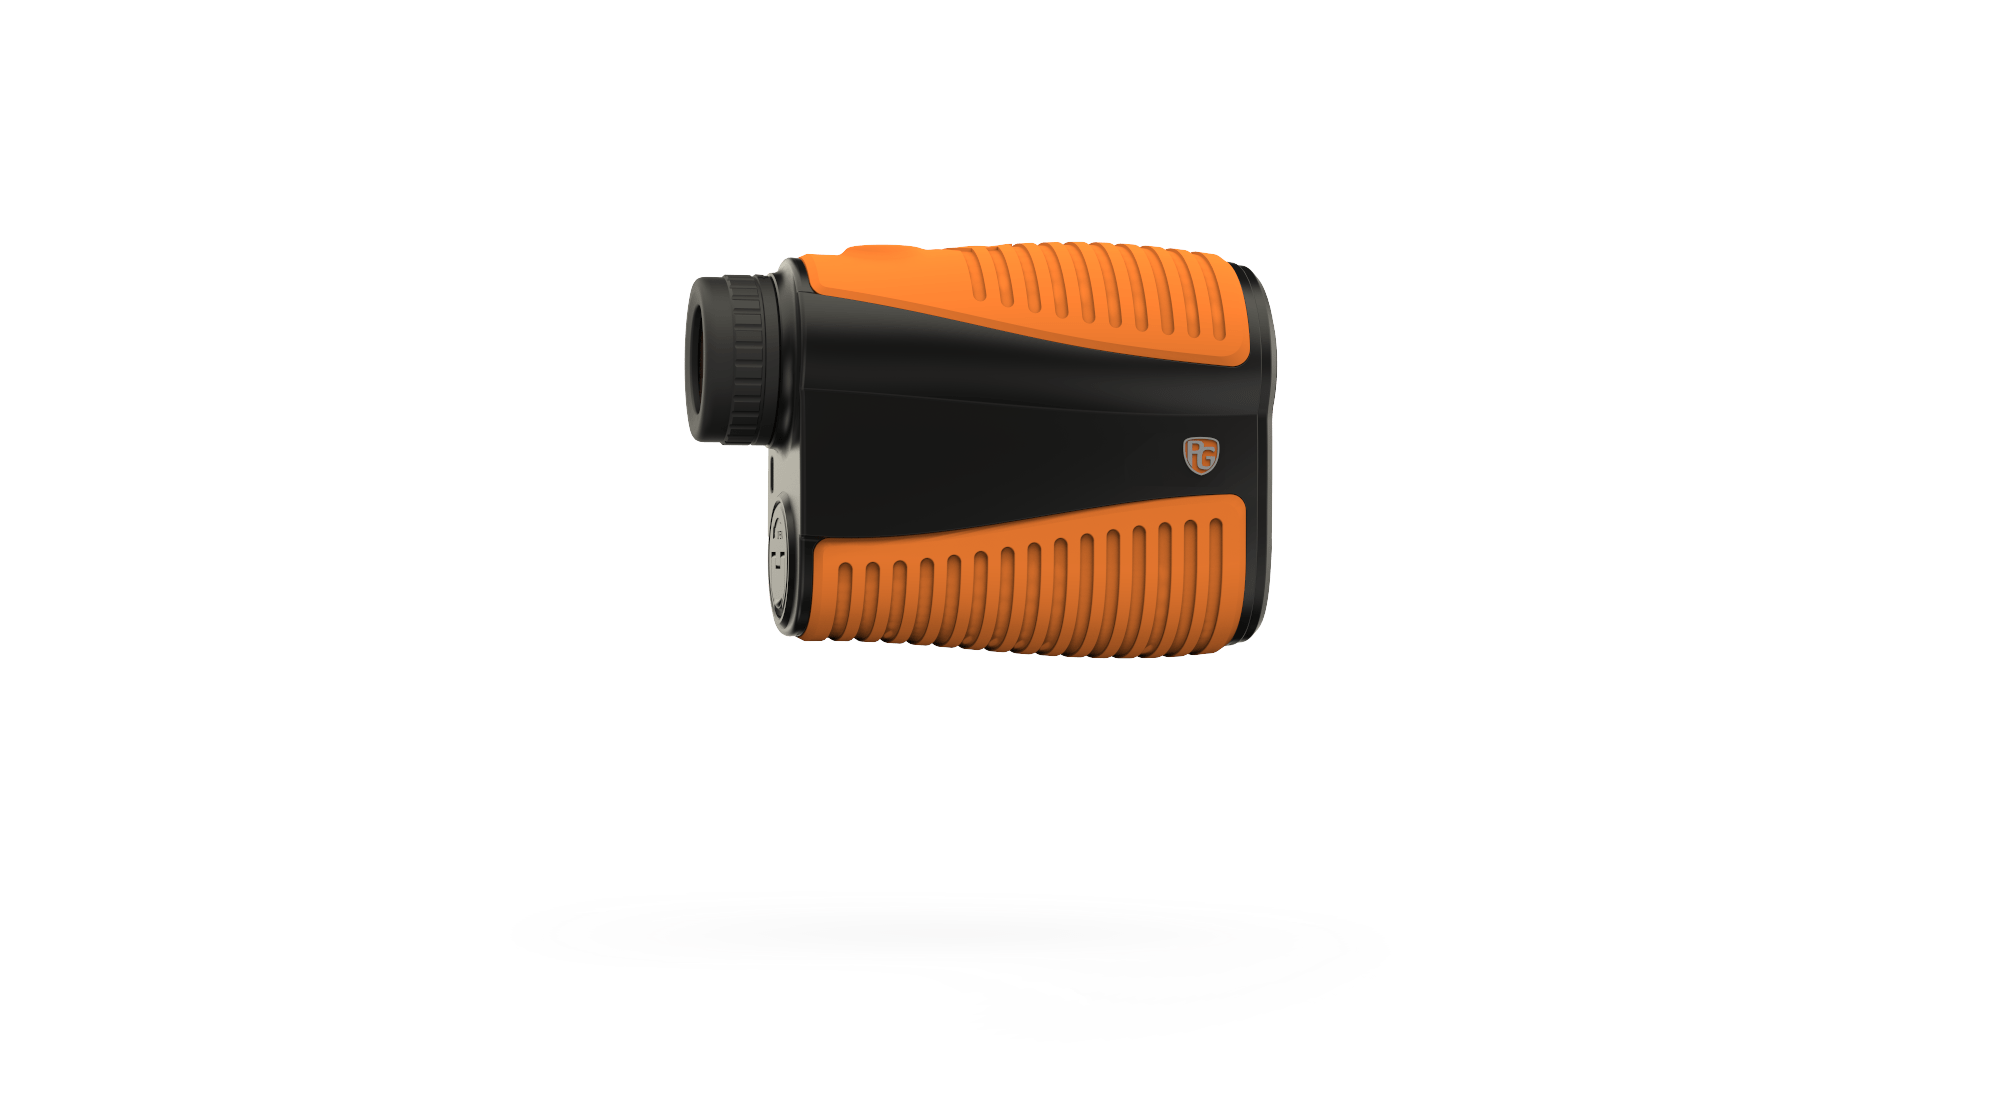 rangefinder-img-37